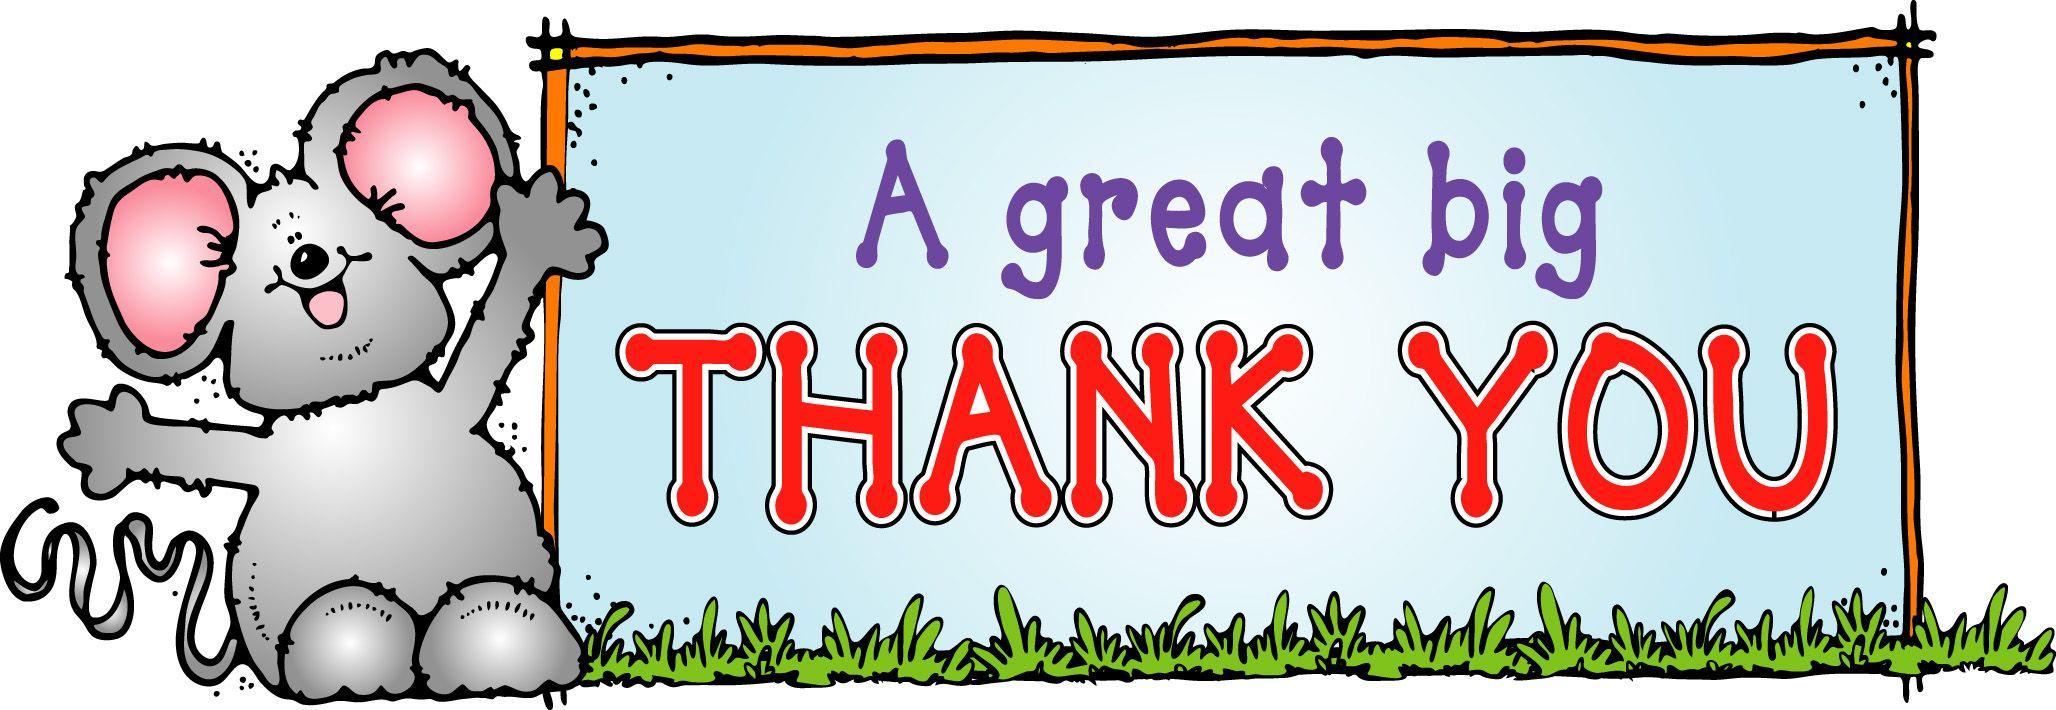 Bing thank you. Pin by dee d